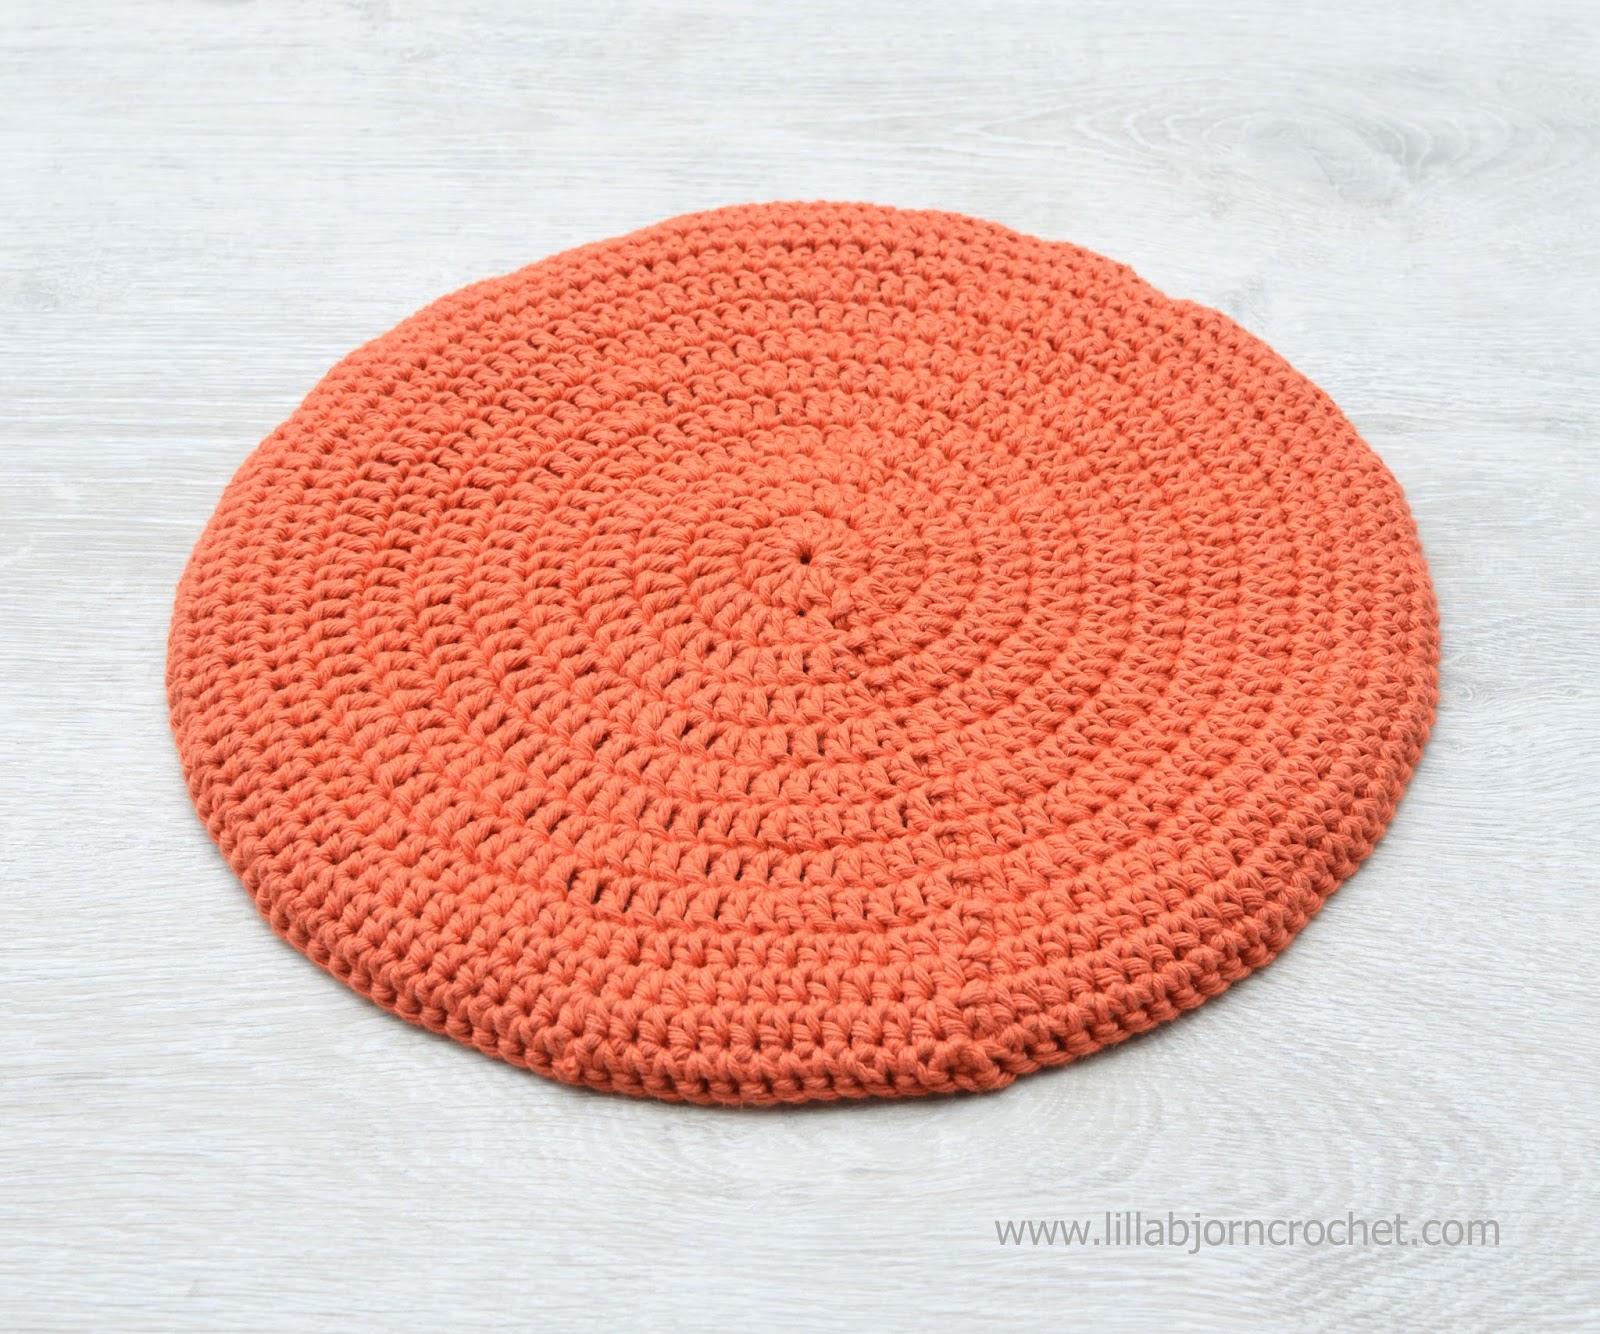 Geometric Mandala: Simple and Clear Crochet Design | LillaBjörn\'s ...